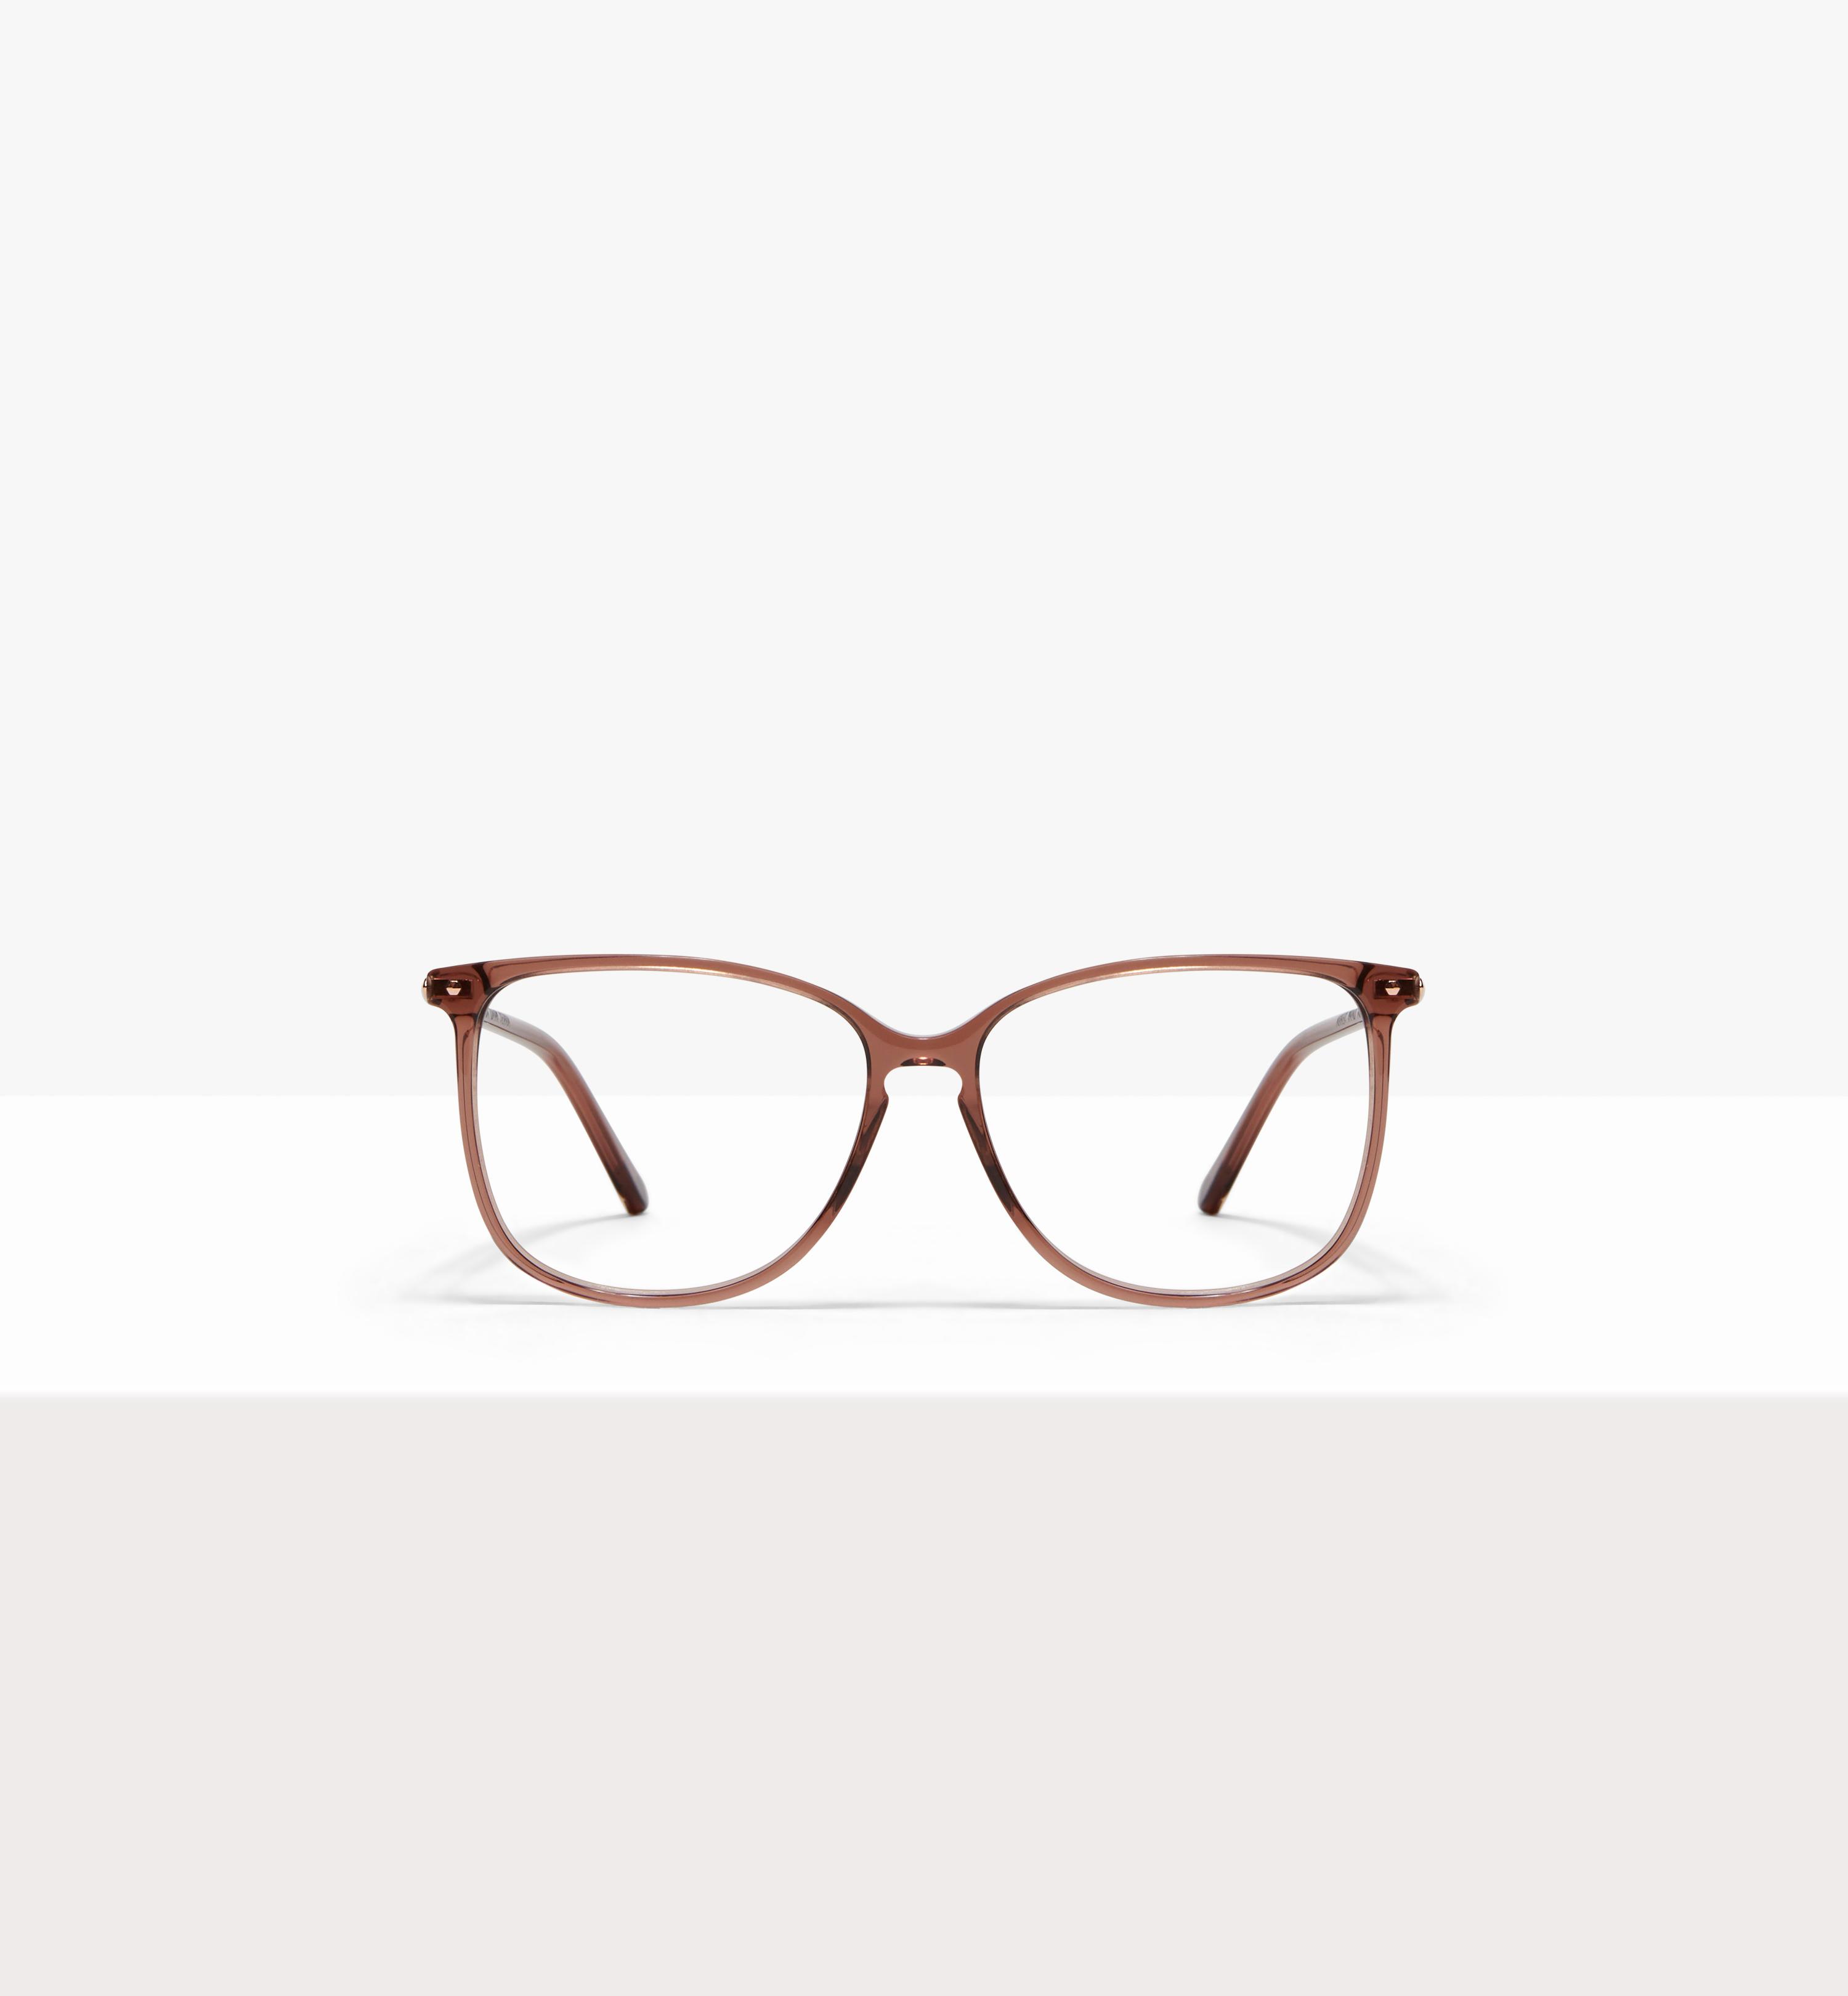 Brown Tortoise Medium Lunettes de soleil femmes hommes Fashion Eyewear années 80